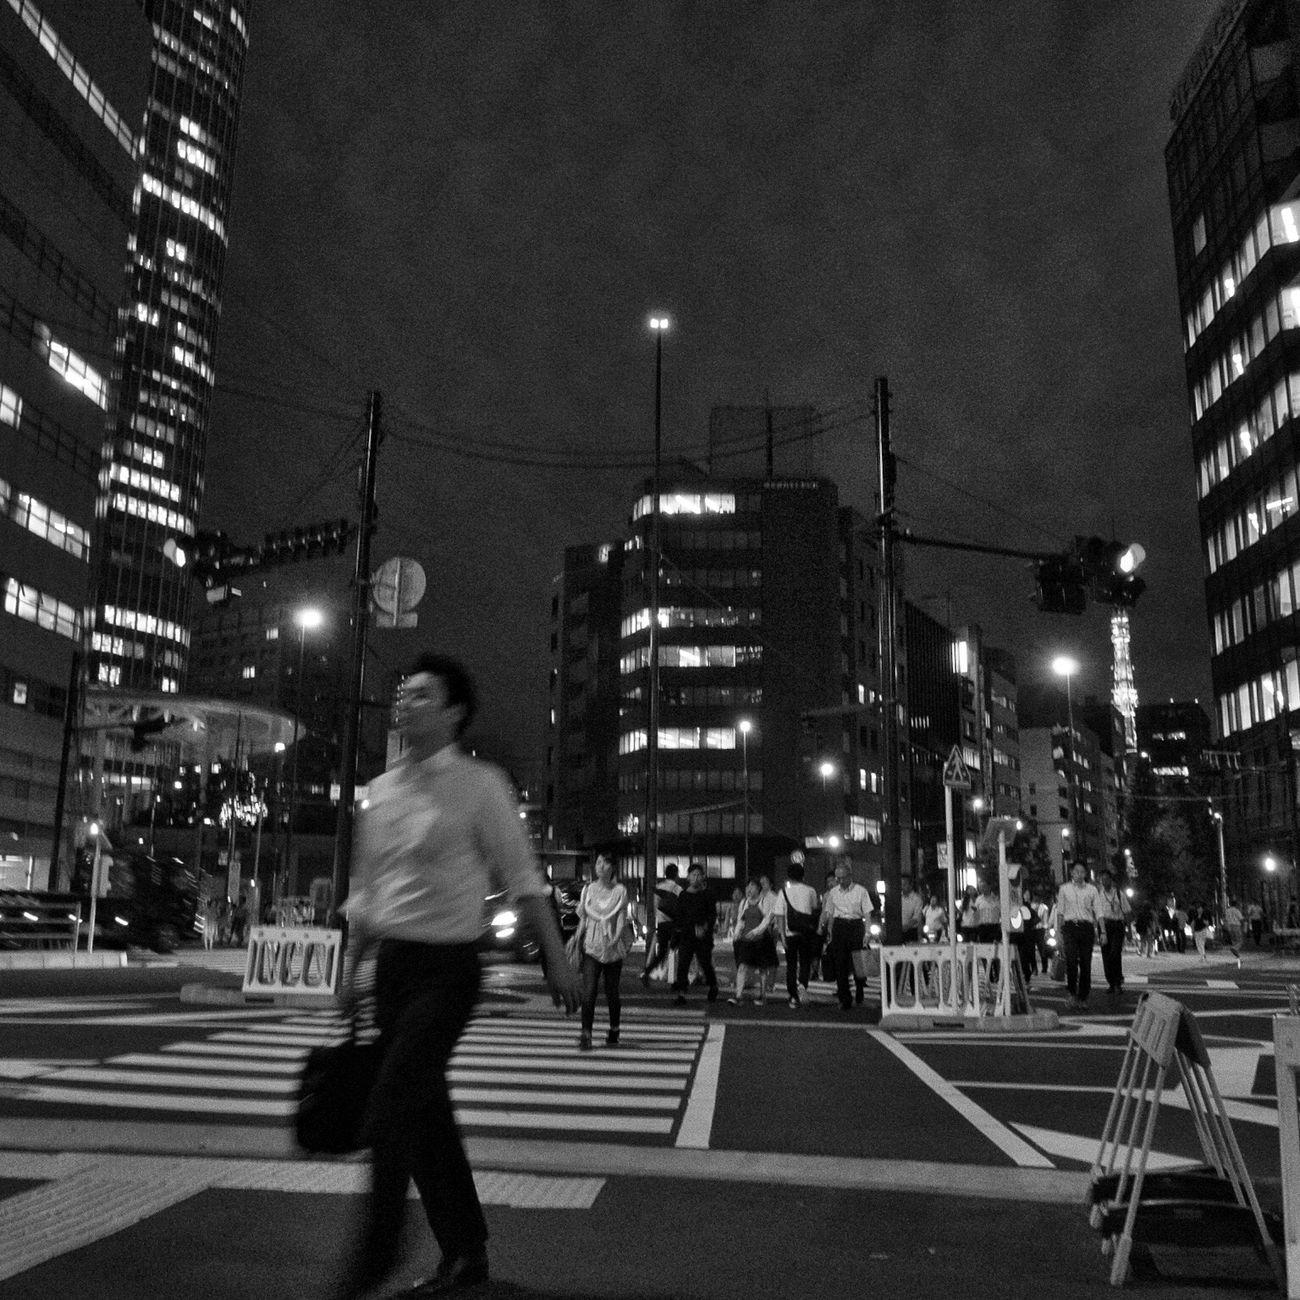 Street City Zebra Crossing Walking City Life Crossing City Street On The Road Nightphotography Night Snapshot Streetphotography_bw B&w Street Photography CityWalk at Toranomon 虎ノ門 , Tokyo Japan